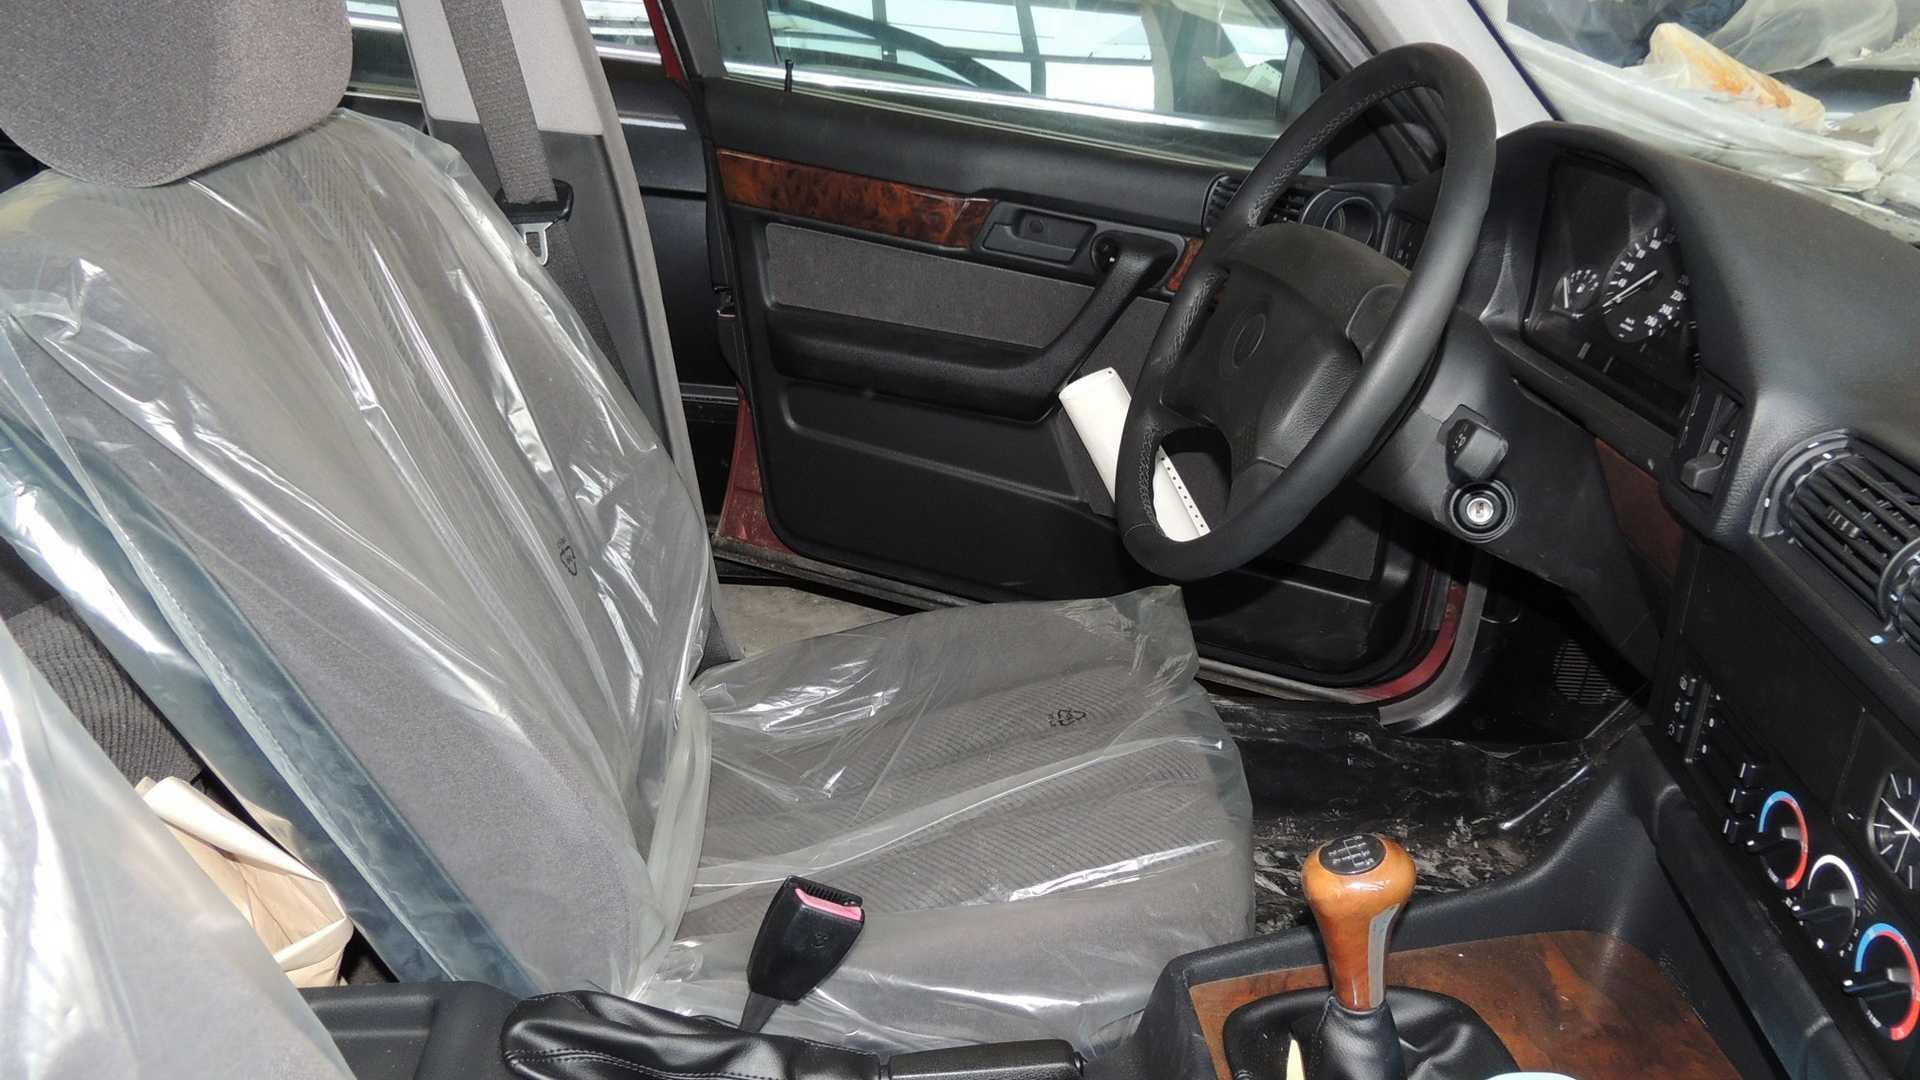 BMW 5 series interior still in plastic